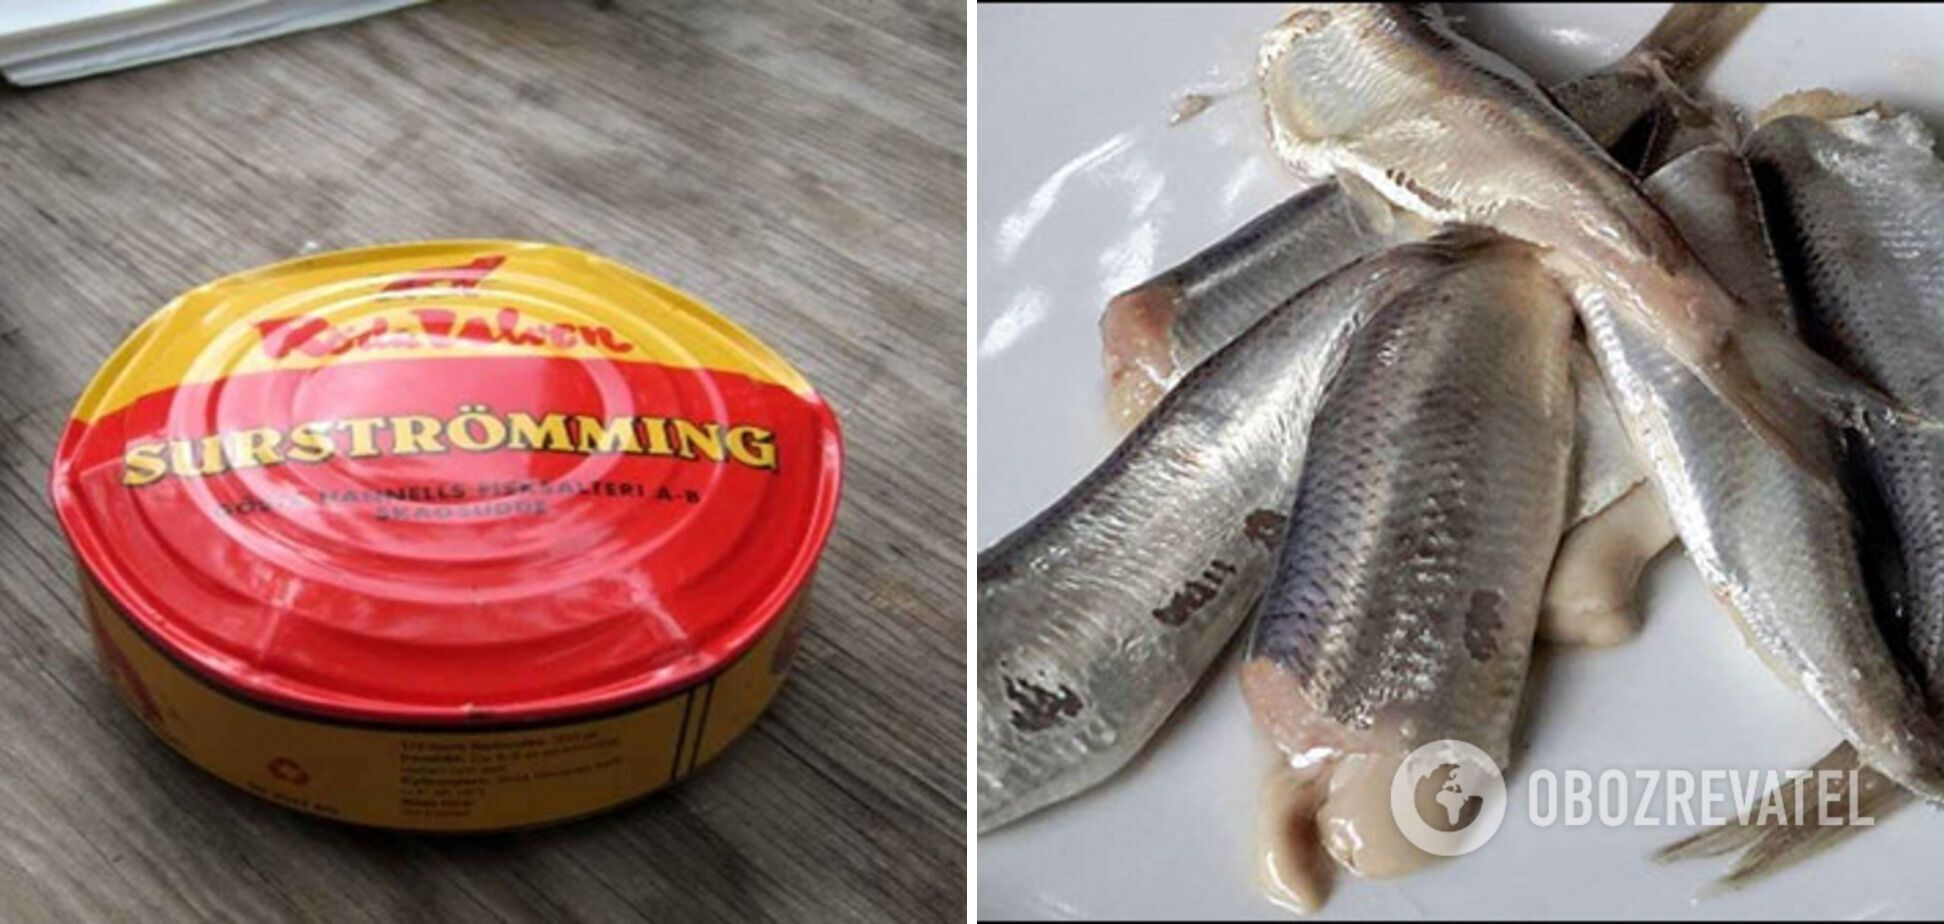 В Швеции едят испорченную рыбу.